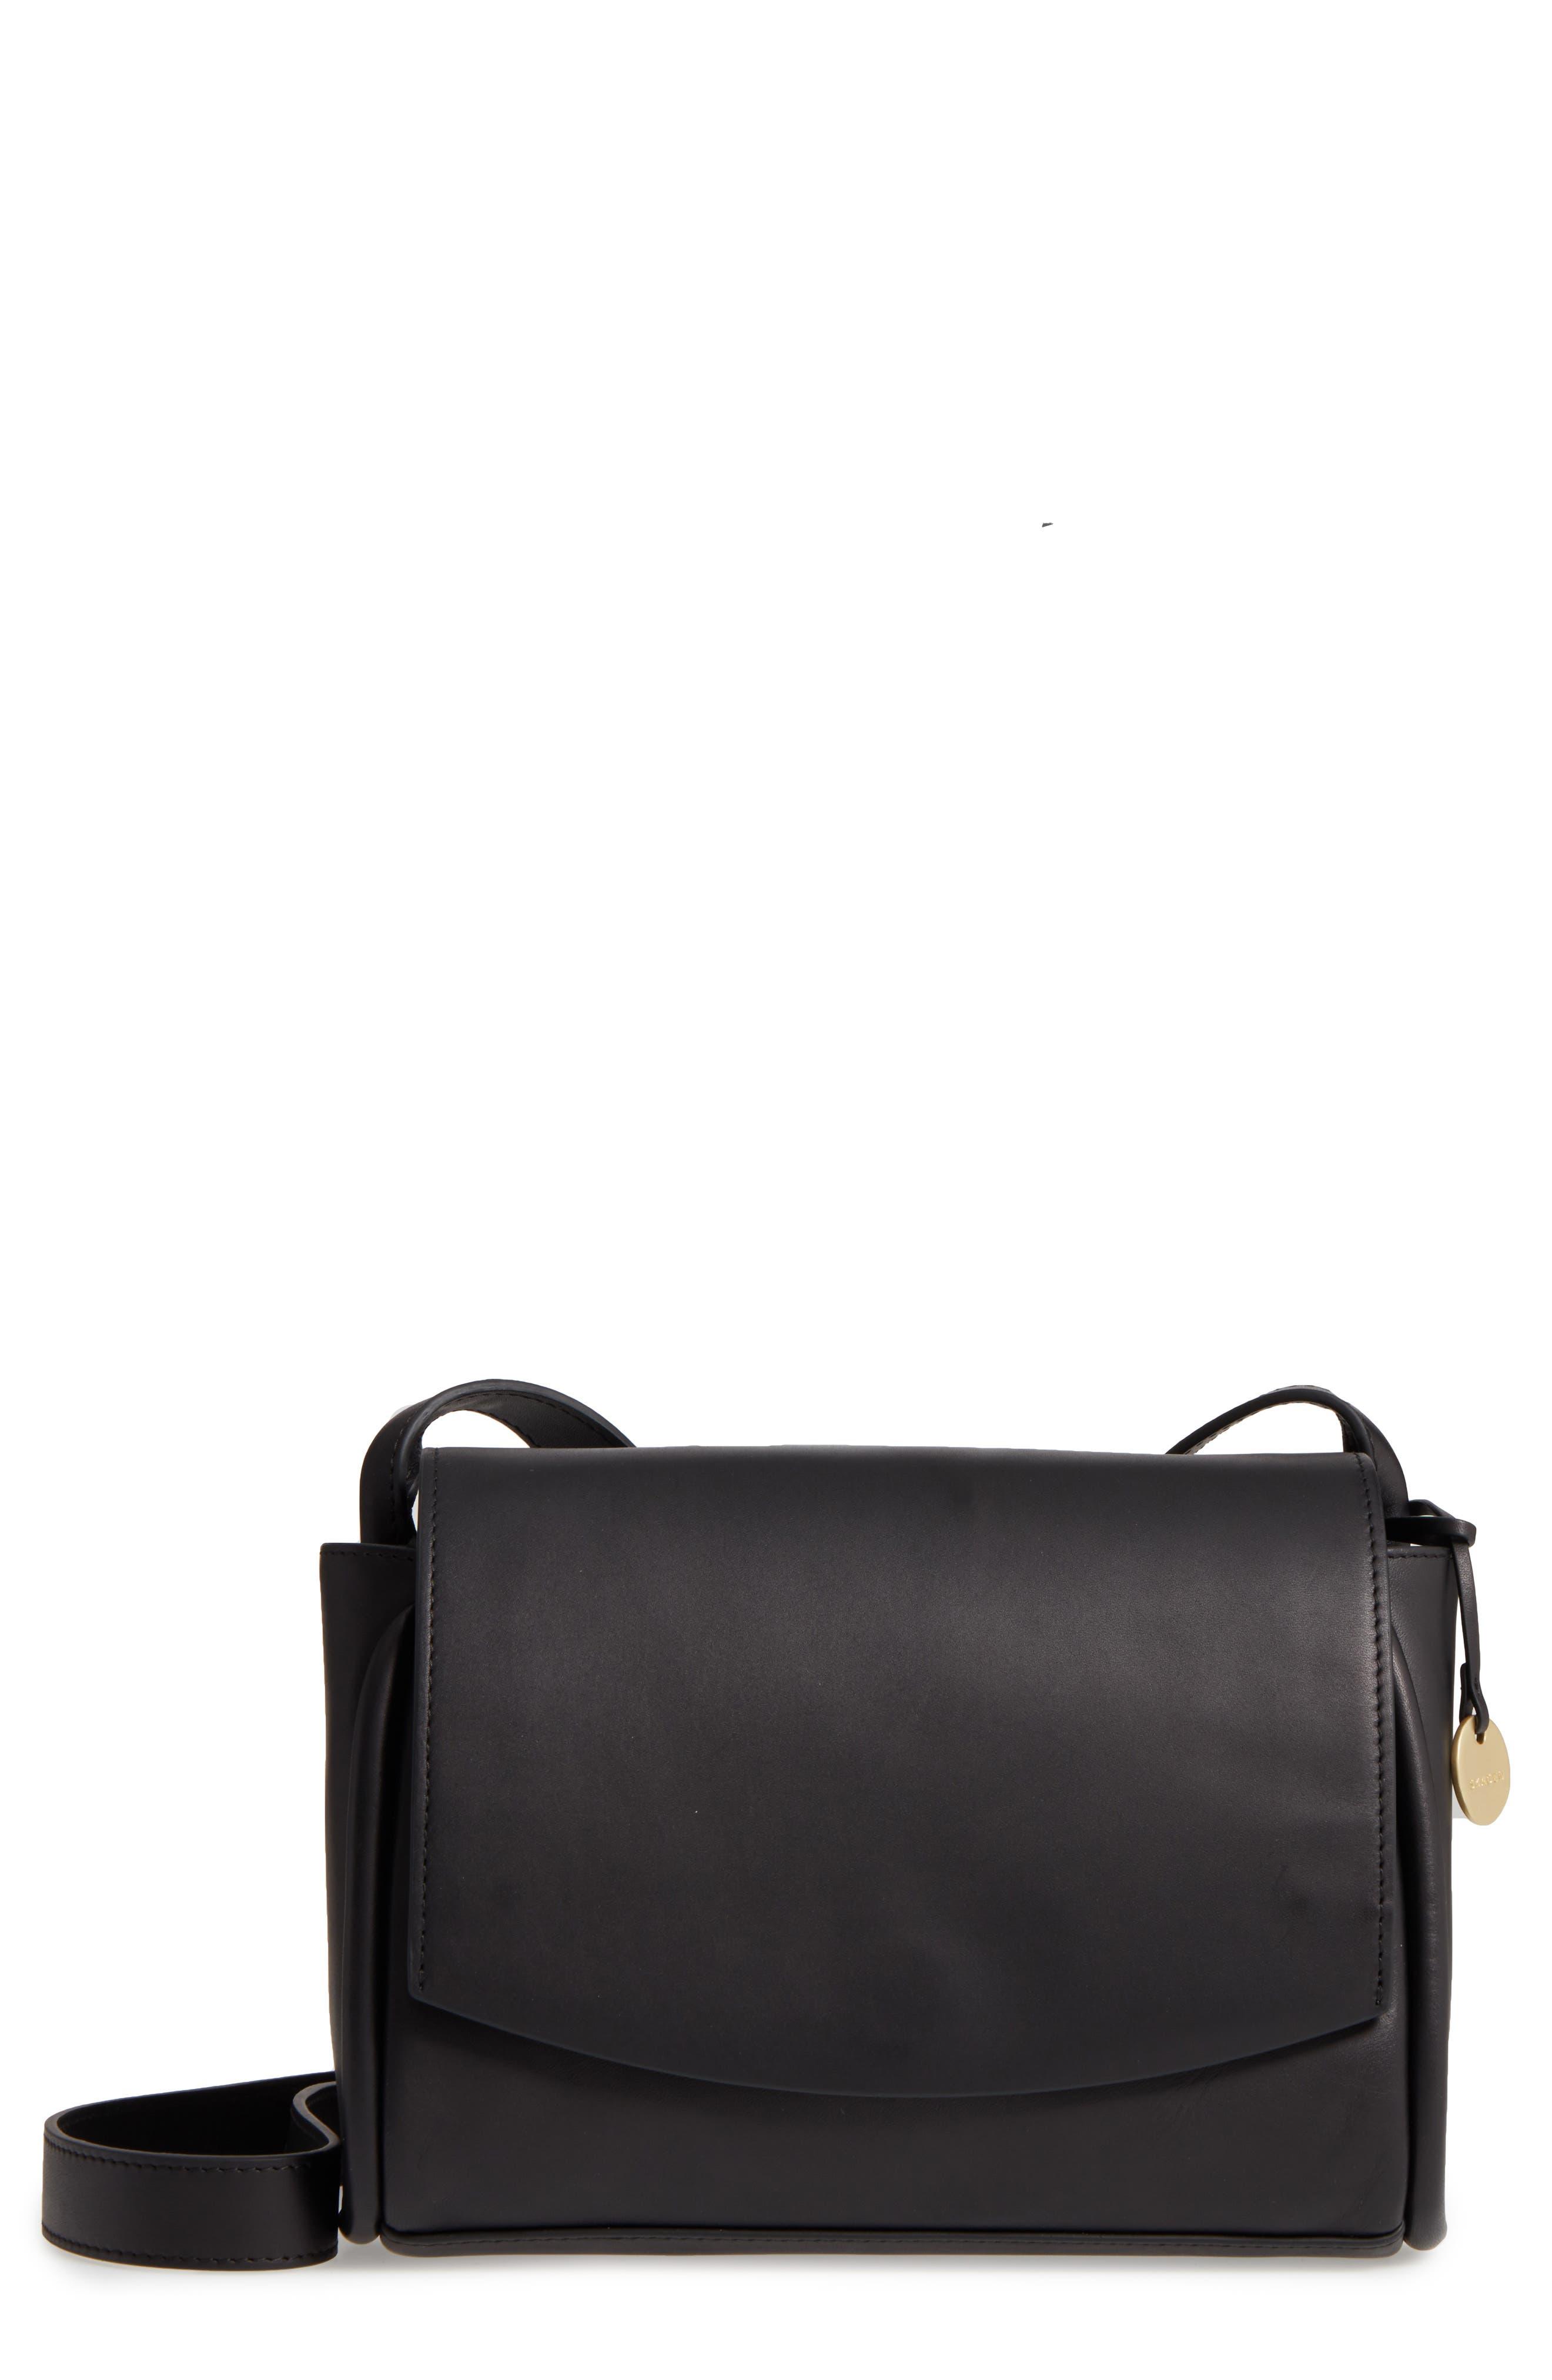 Sylvi Leather Crossbody Bag,                             Main thumbnail 1, color,                             001